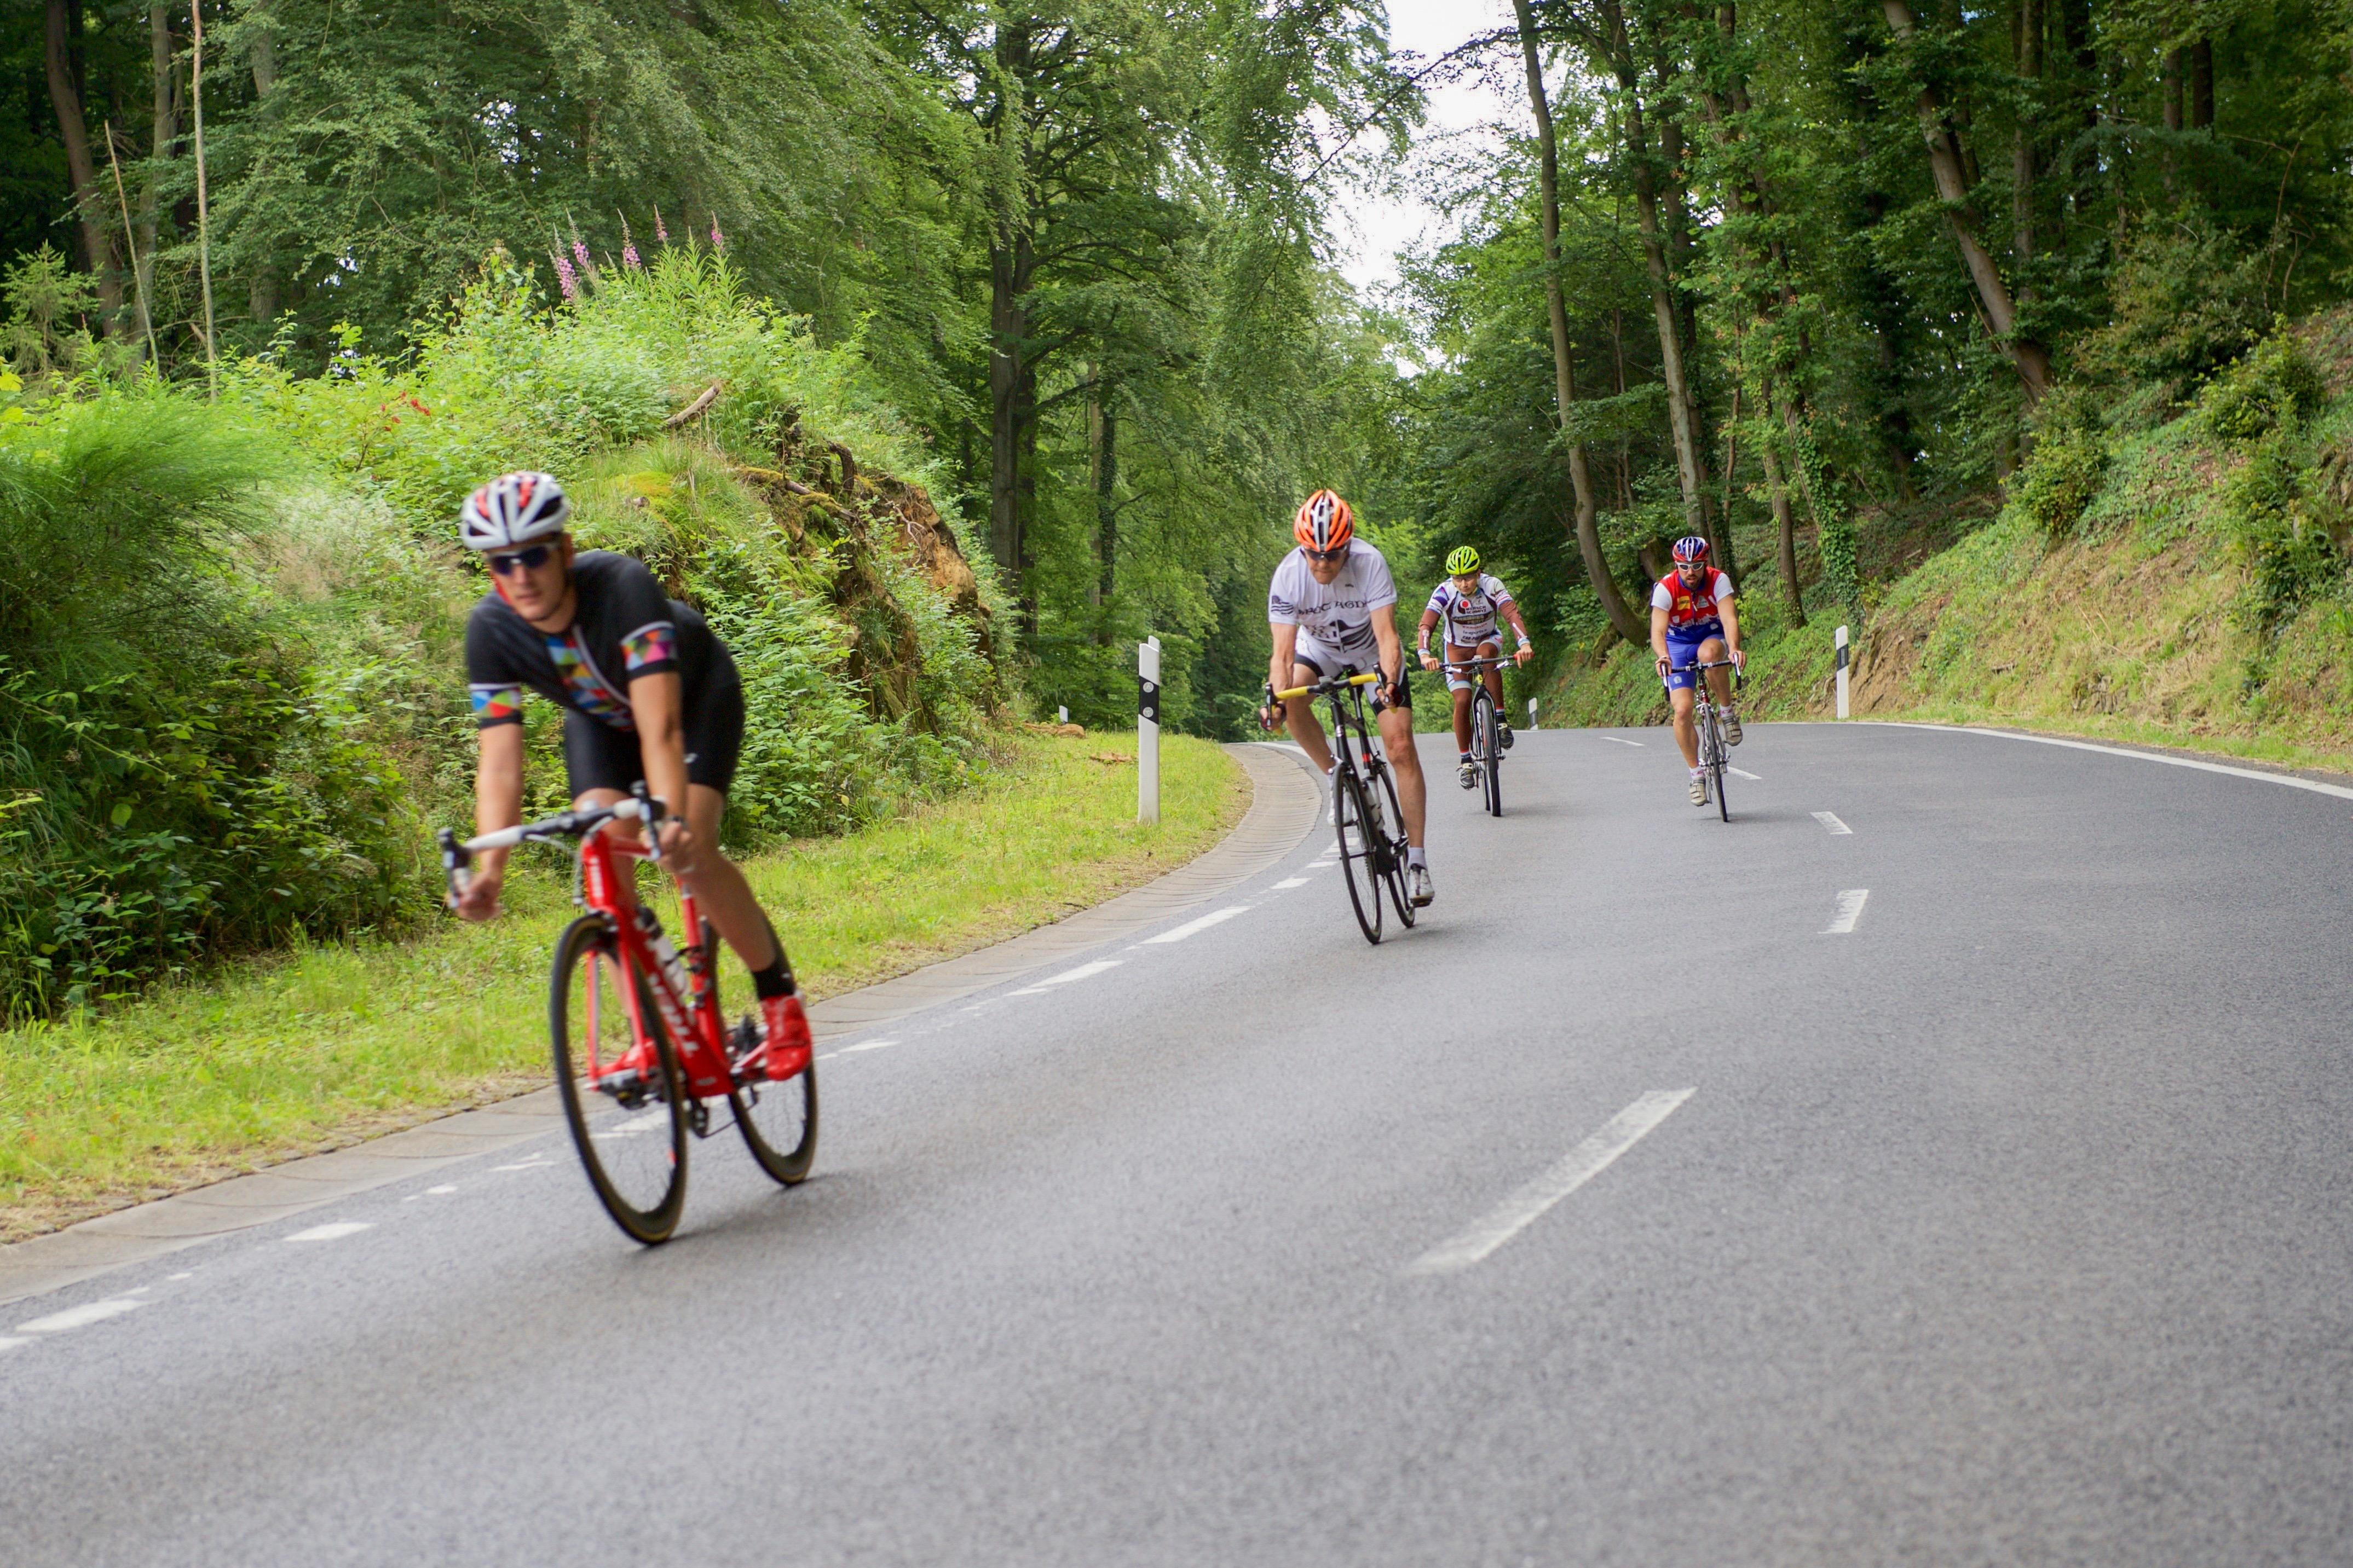 File:Secretary Kerry Joins Bike Ride in Luxembourg (27734238293).jpg -  Wikimedia Commons